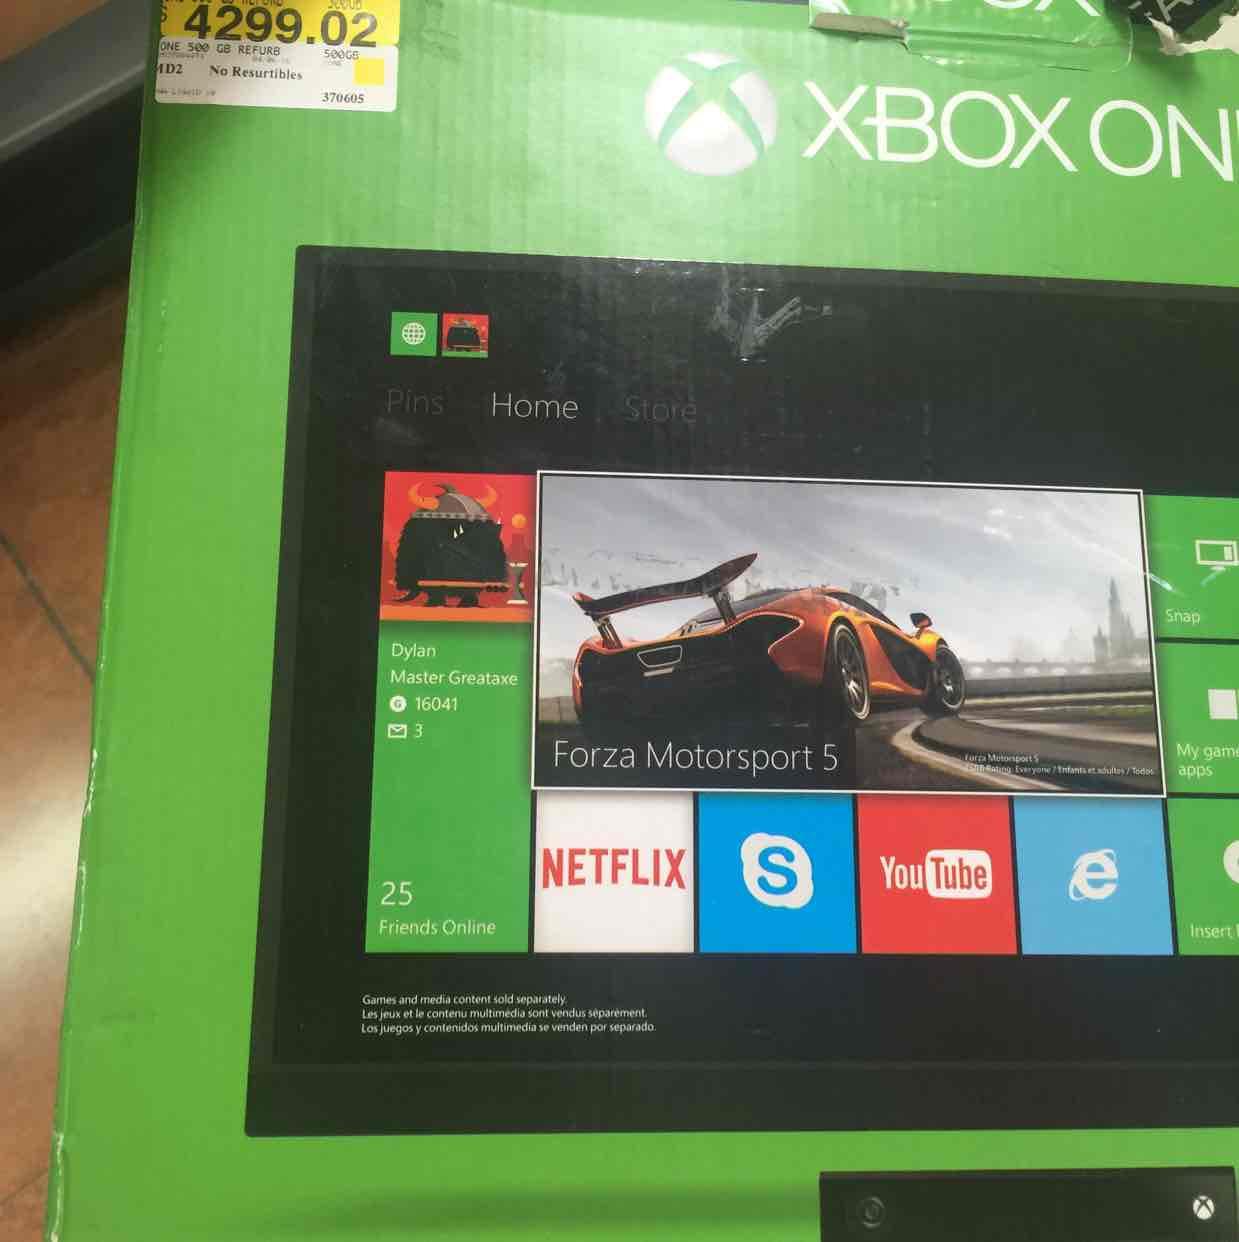 Walmart: Xbox One de 500gb con Kinect Refurbished a $4,299.02